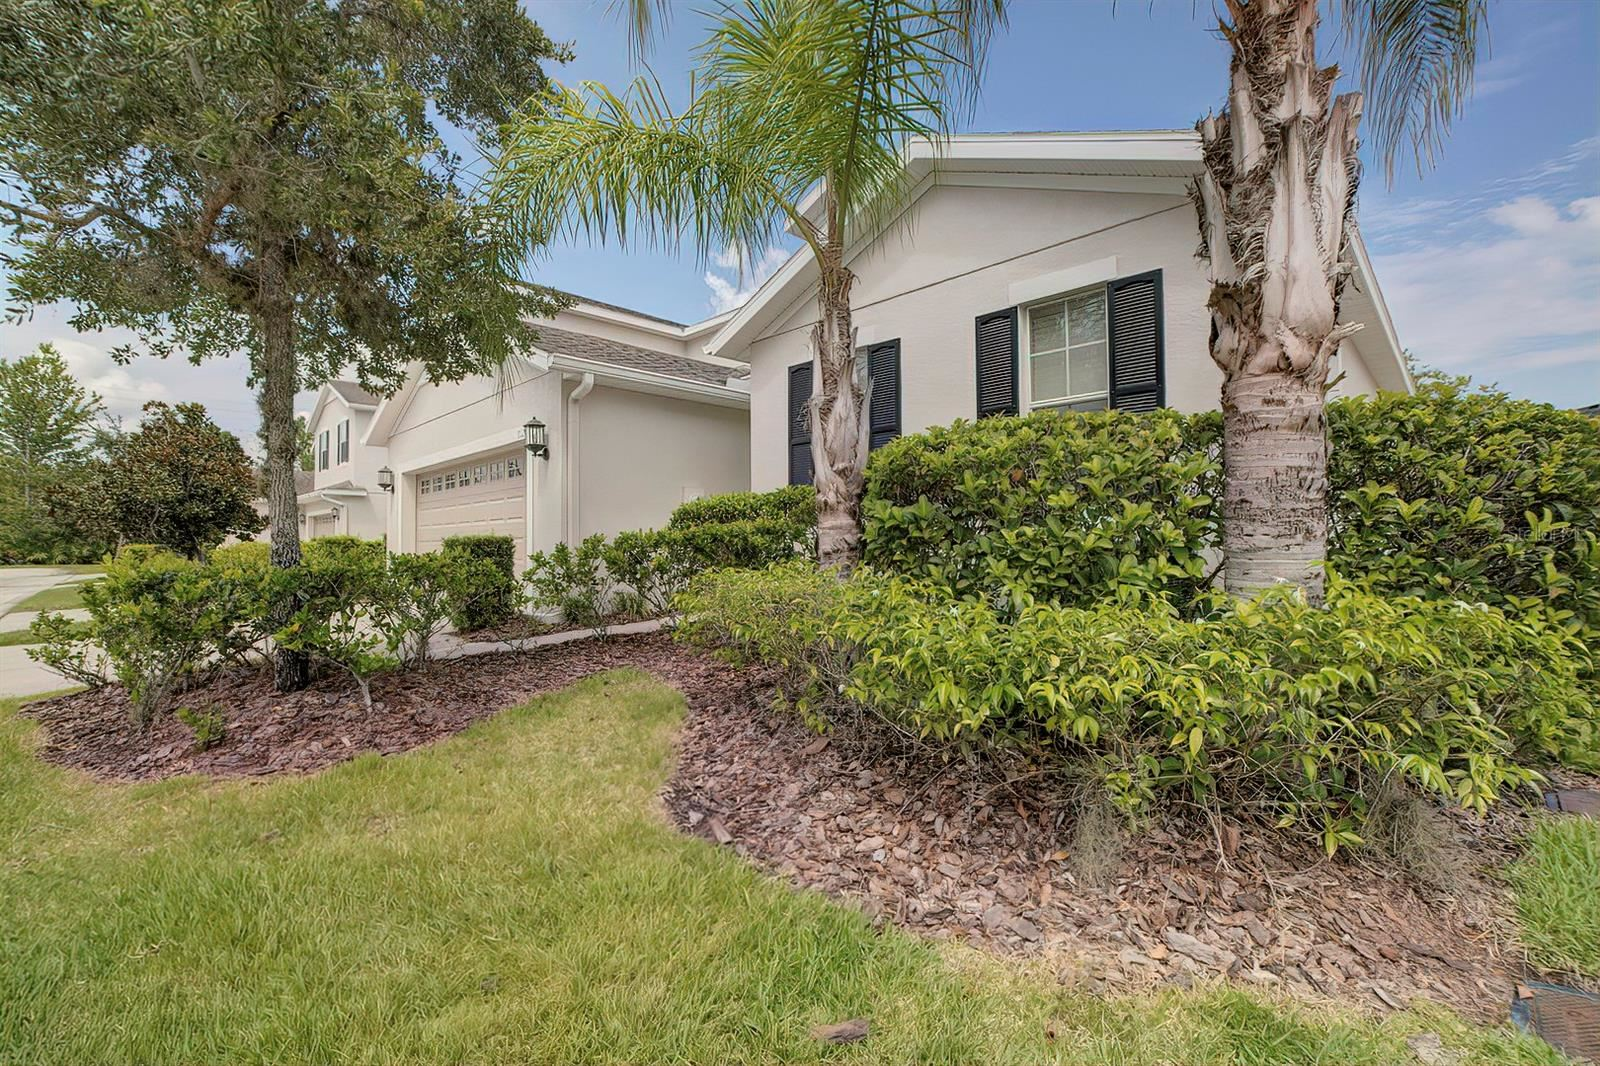 8120 HAMPTON VIEW LANE, Tampa, FL 33647 - MLS#: U8133599